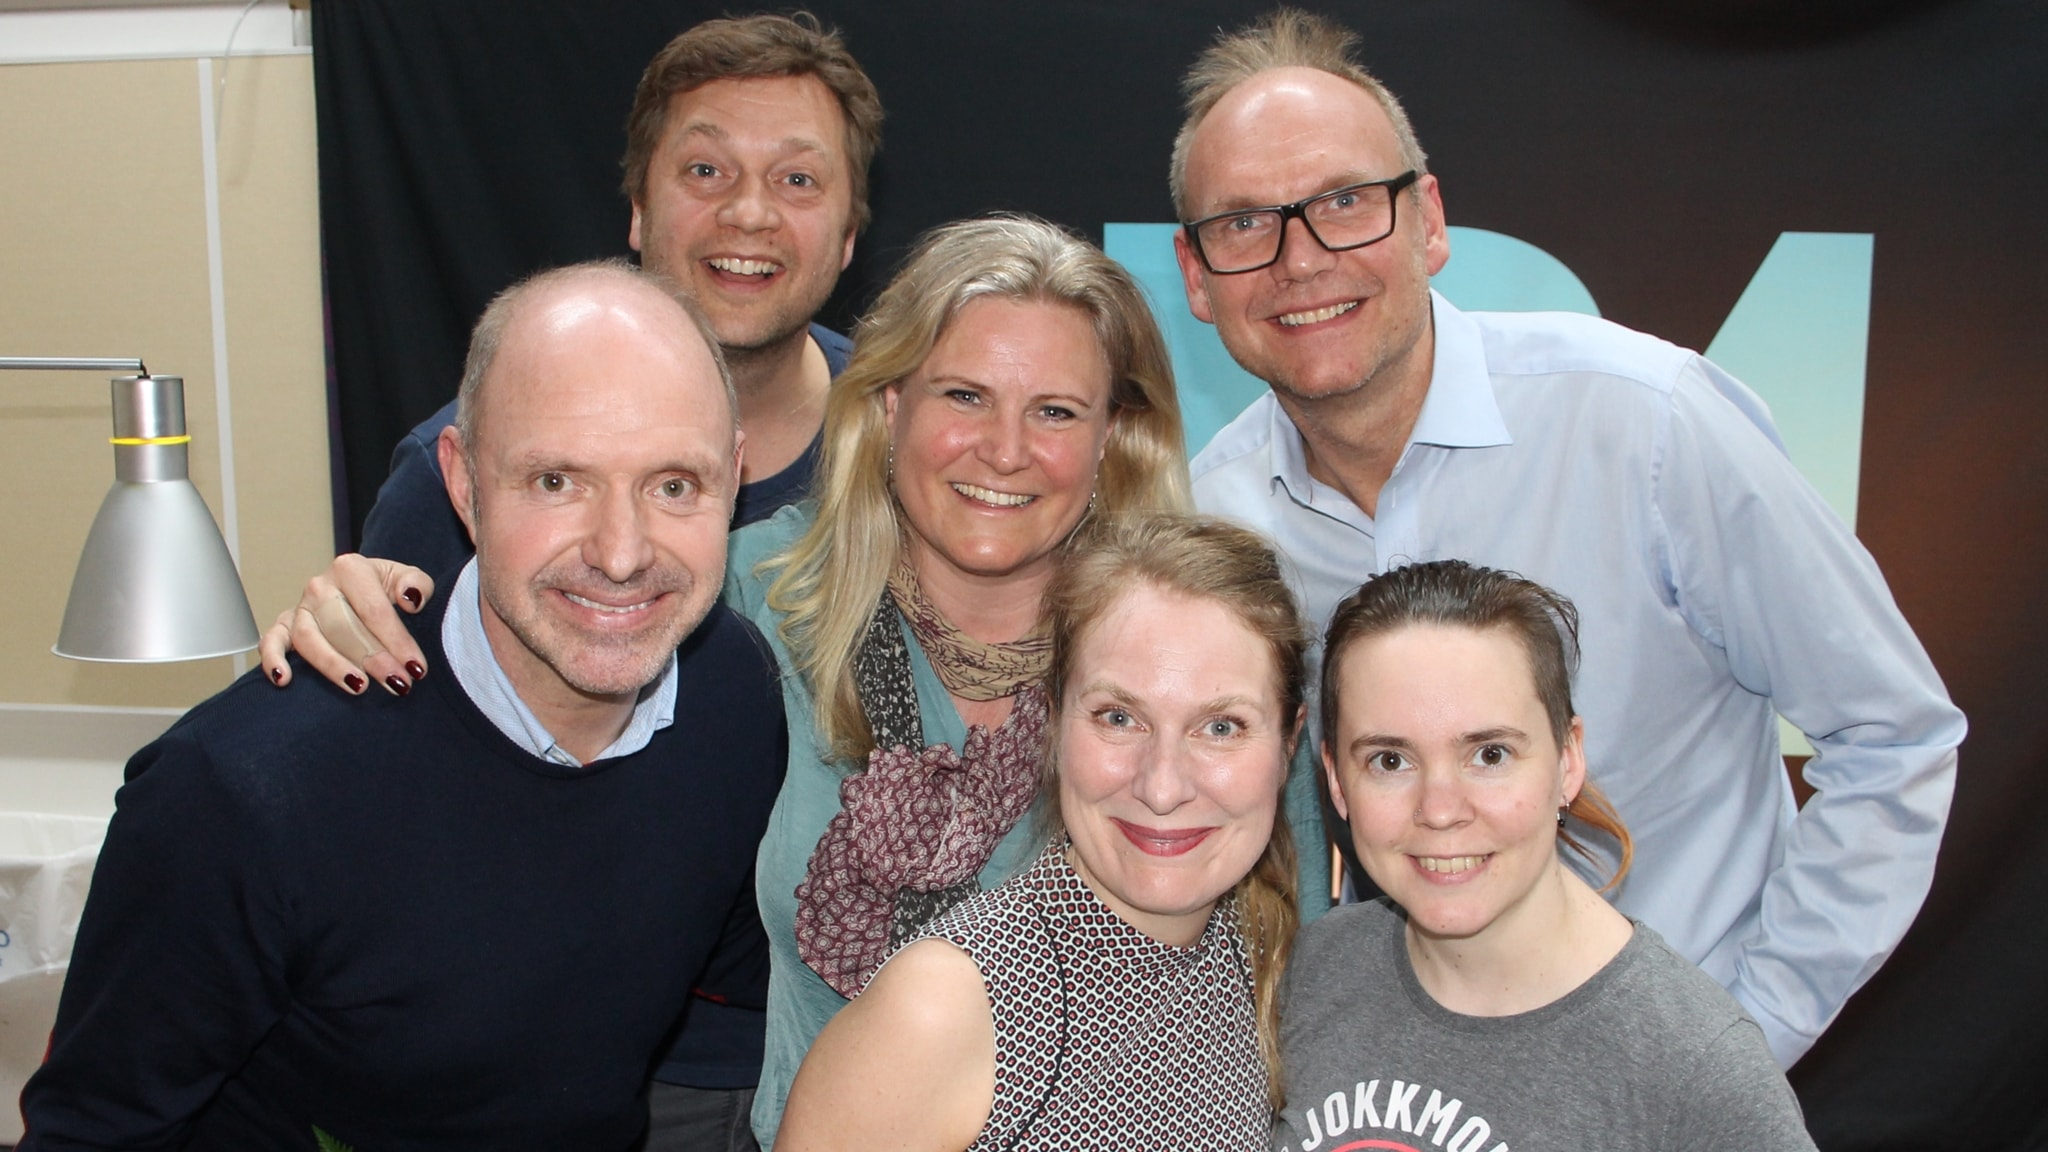 Thomas Ravelli, Johan Petersson, Camilla Kvartoft och Anders S Nilsson!